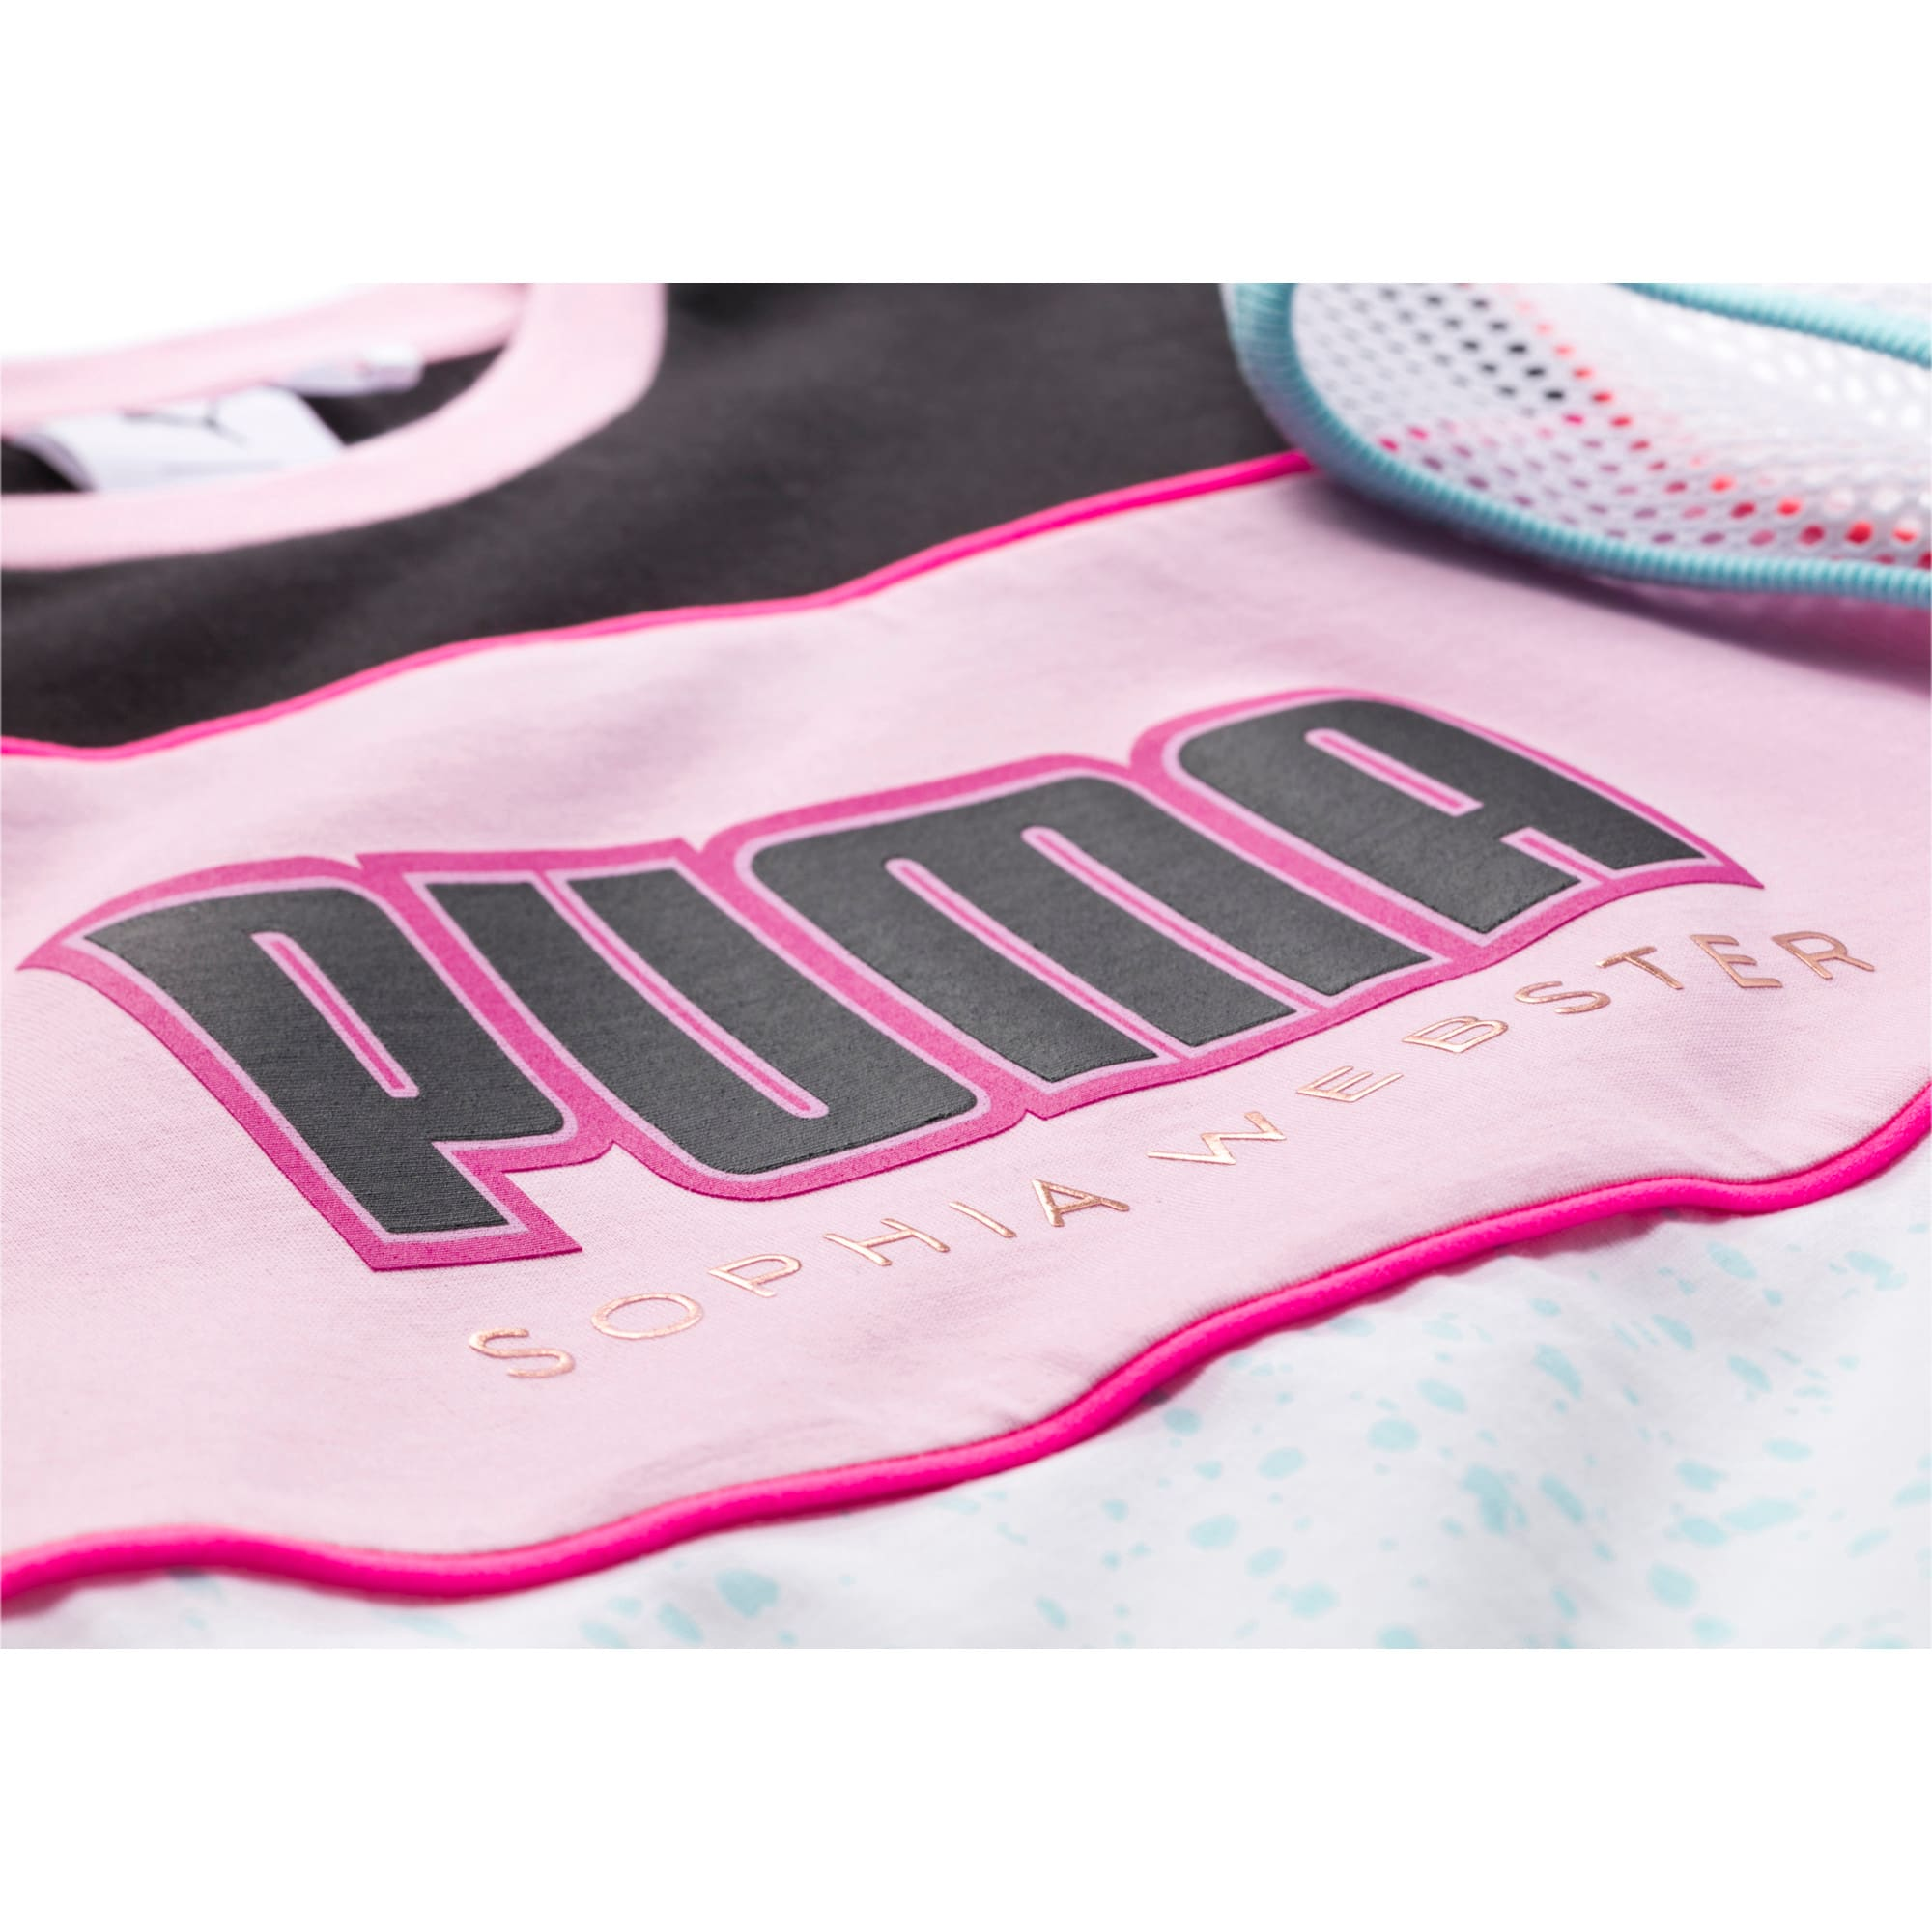 Thumbnail 7 of キッズ ガールズ PUMA x SOPHIA WEBSTER Tシャツ, Puma White, medium-JPN